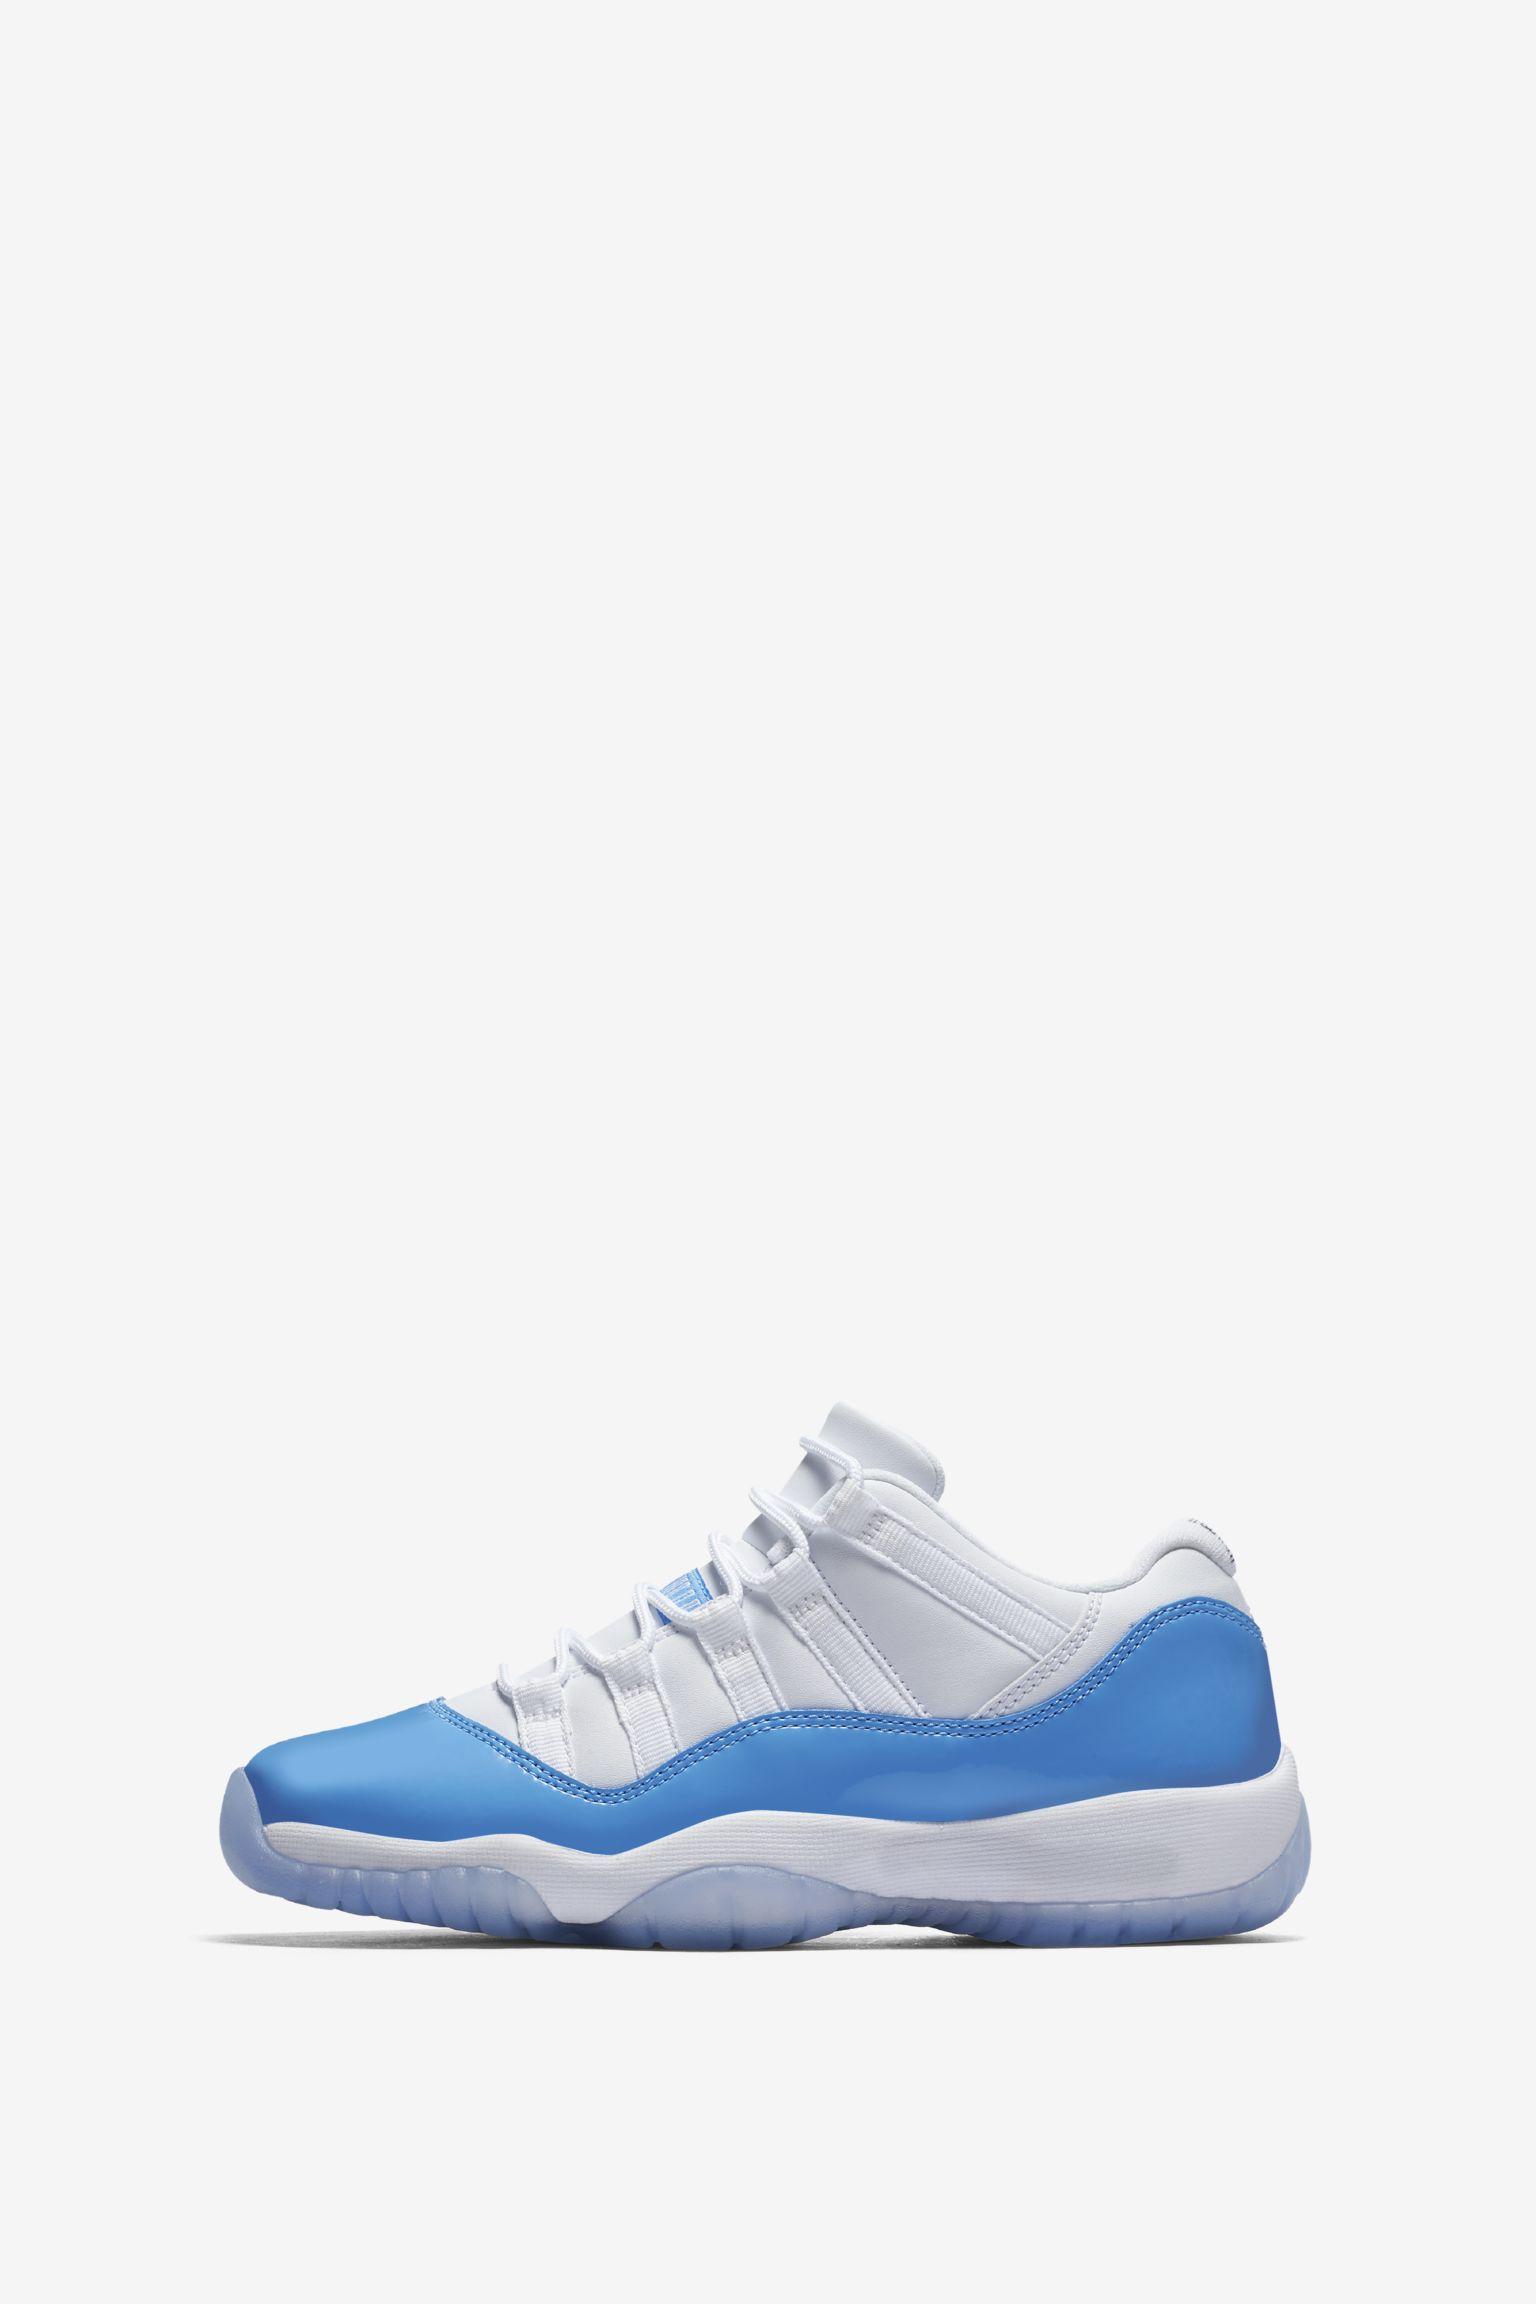 Air Jordan 11 Retro Low  White   University Blue . Nike+ SNKRS 76c447d8c0a3